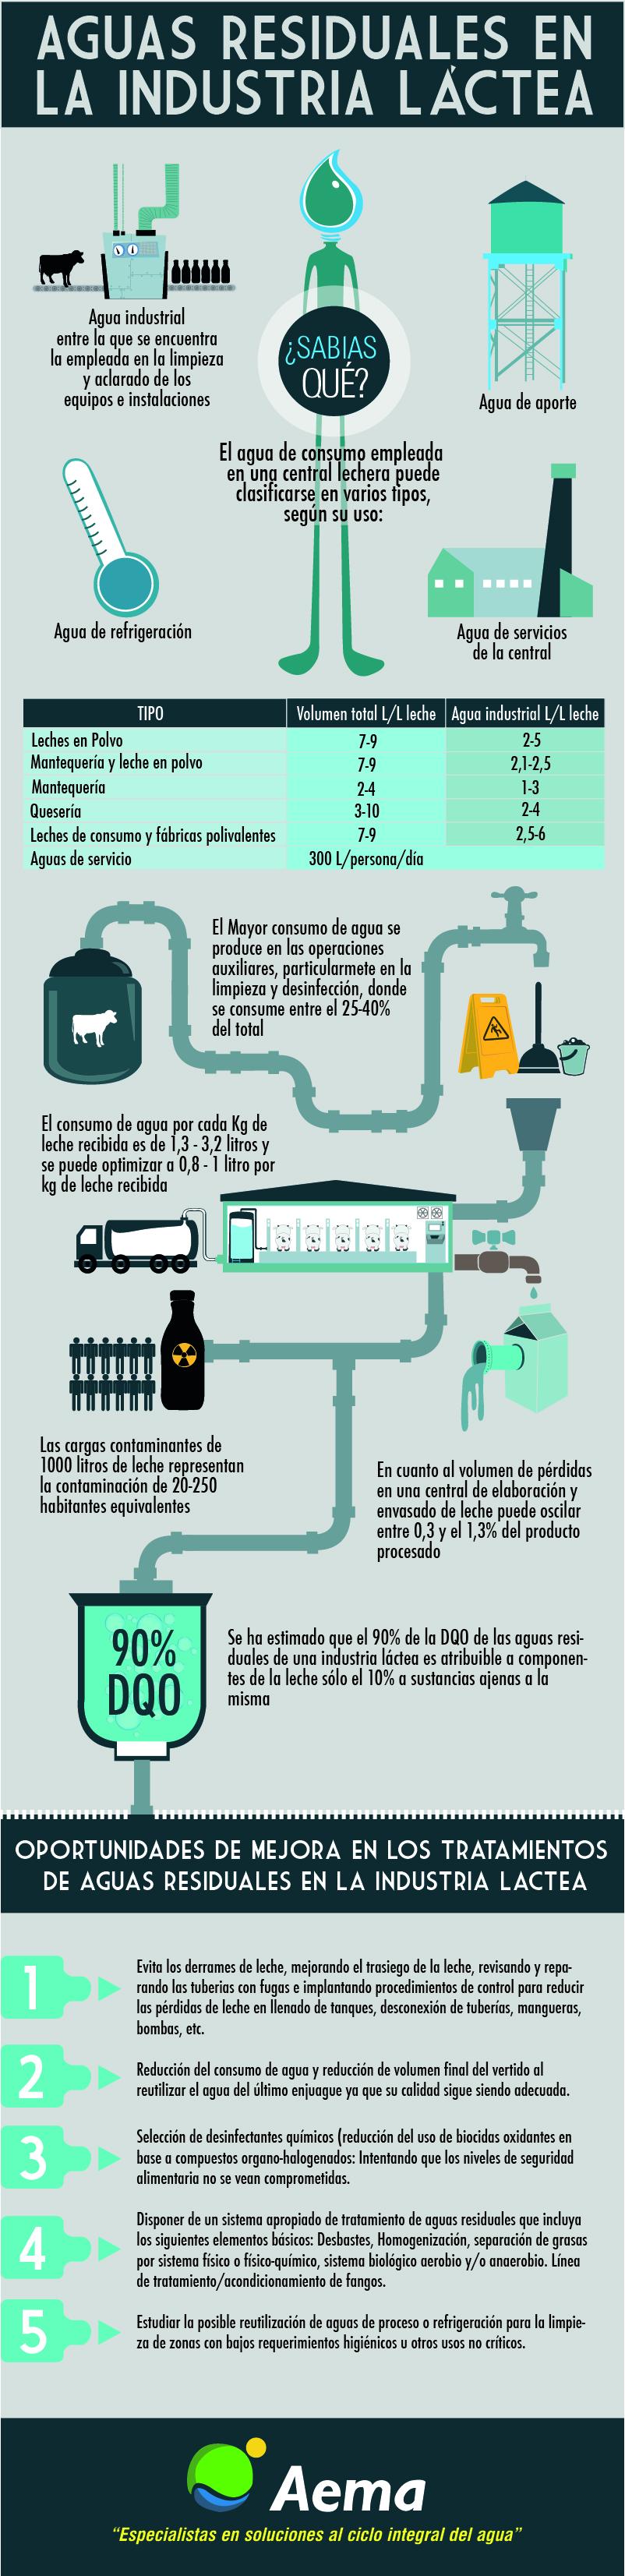 Aguas industria Láctea Archives - Aguas Industriales | Aguas ...